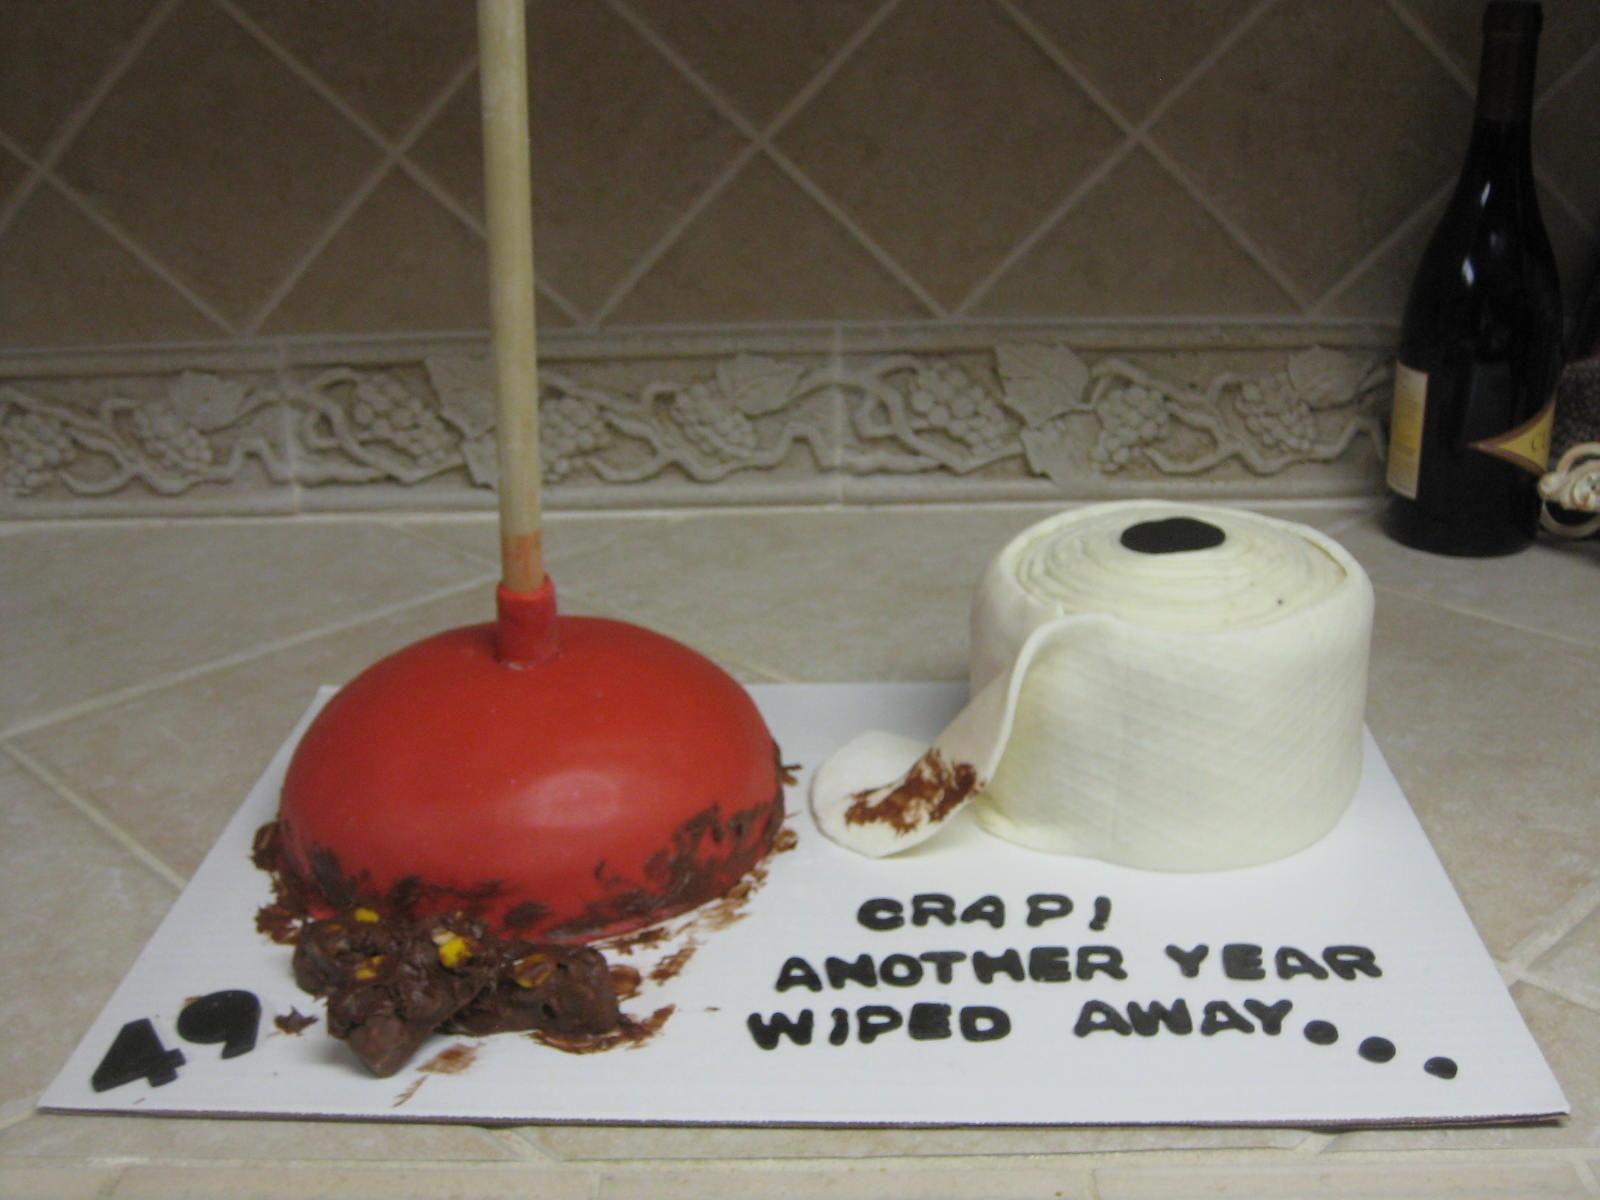 6 Most Inappropriate Birthday Cakes Photo Epic Birthday Cake